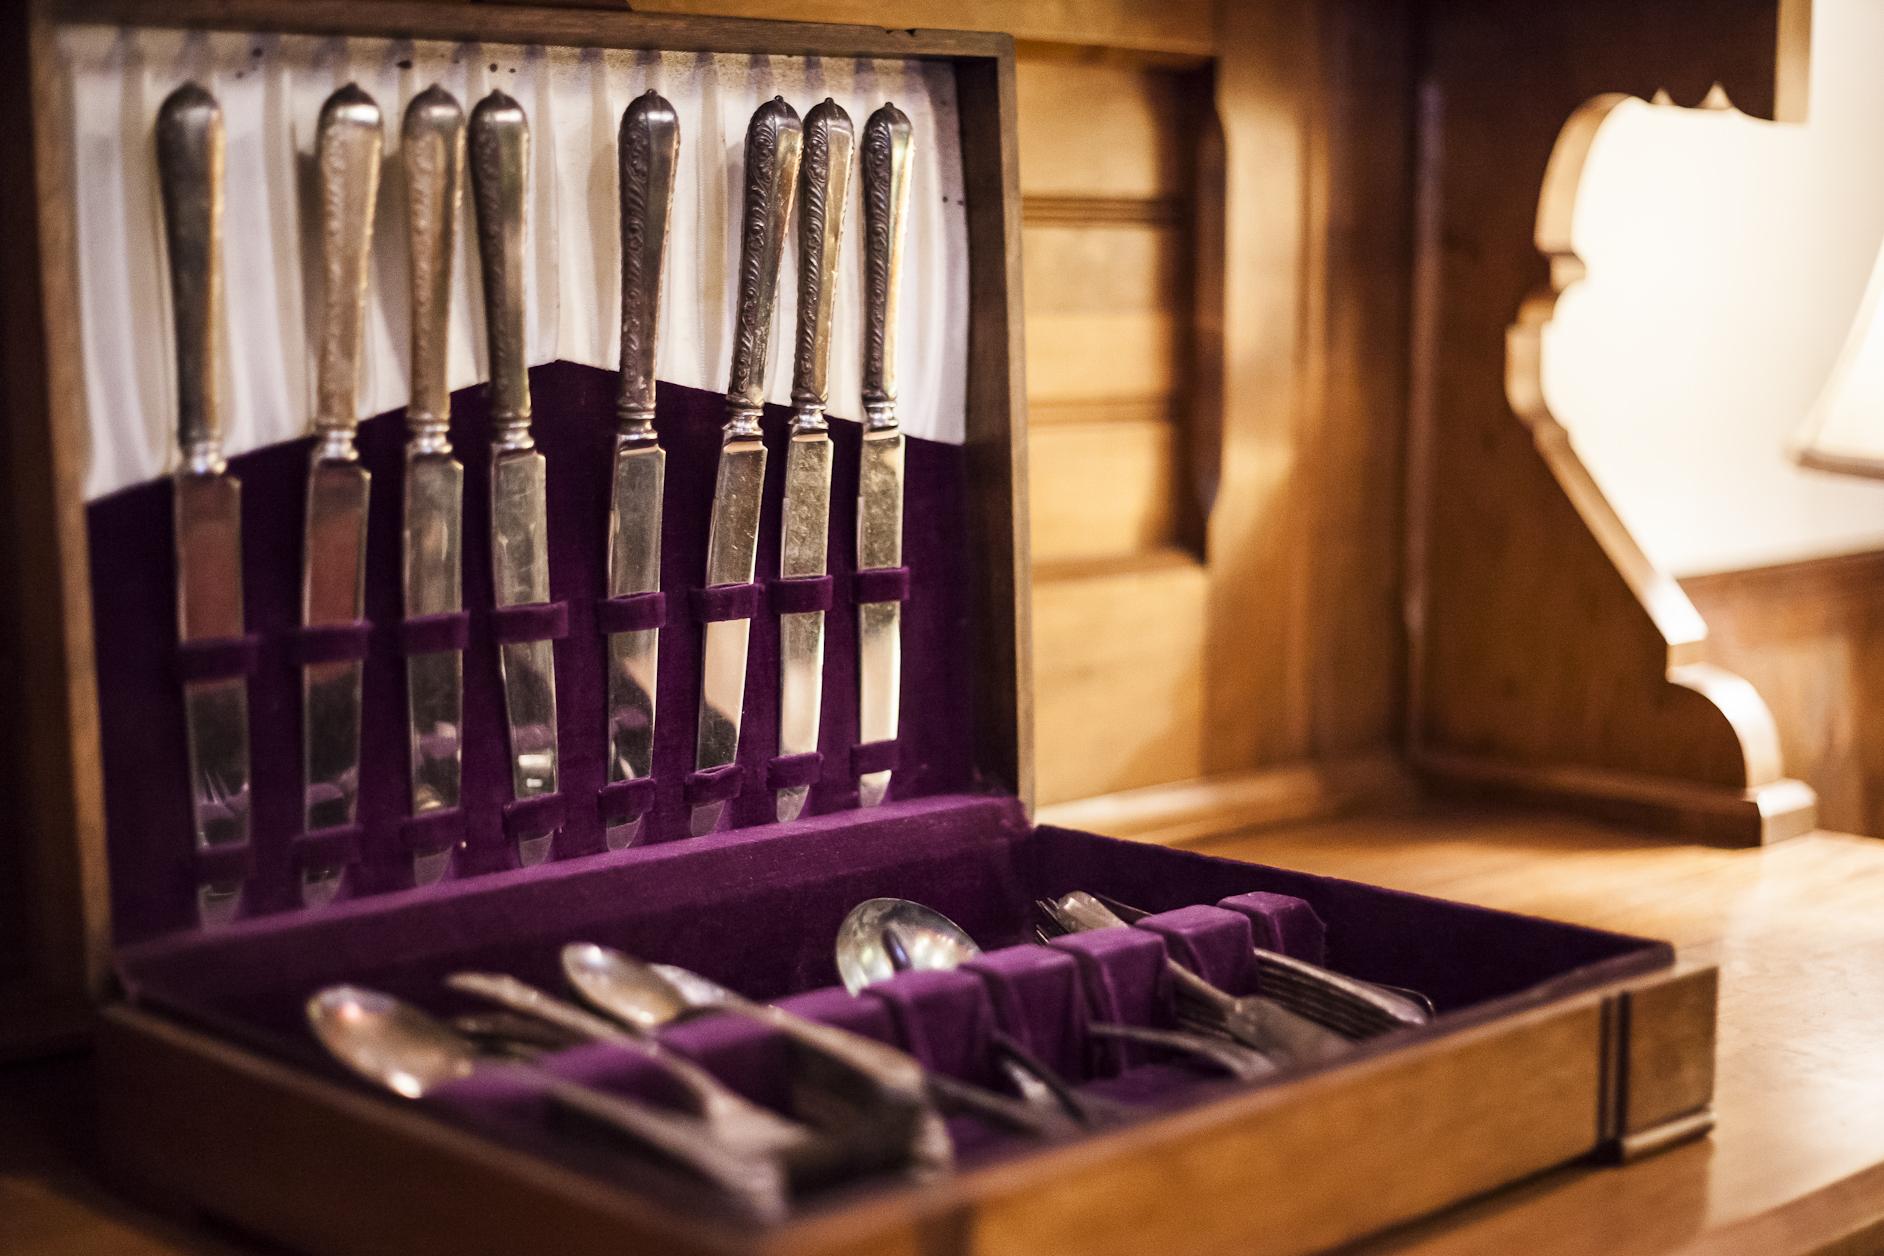 Old Antique Kitchen Knives